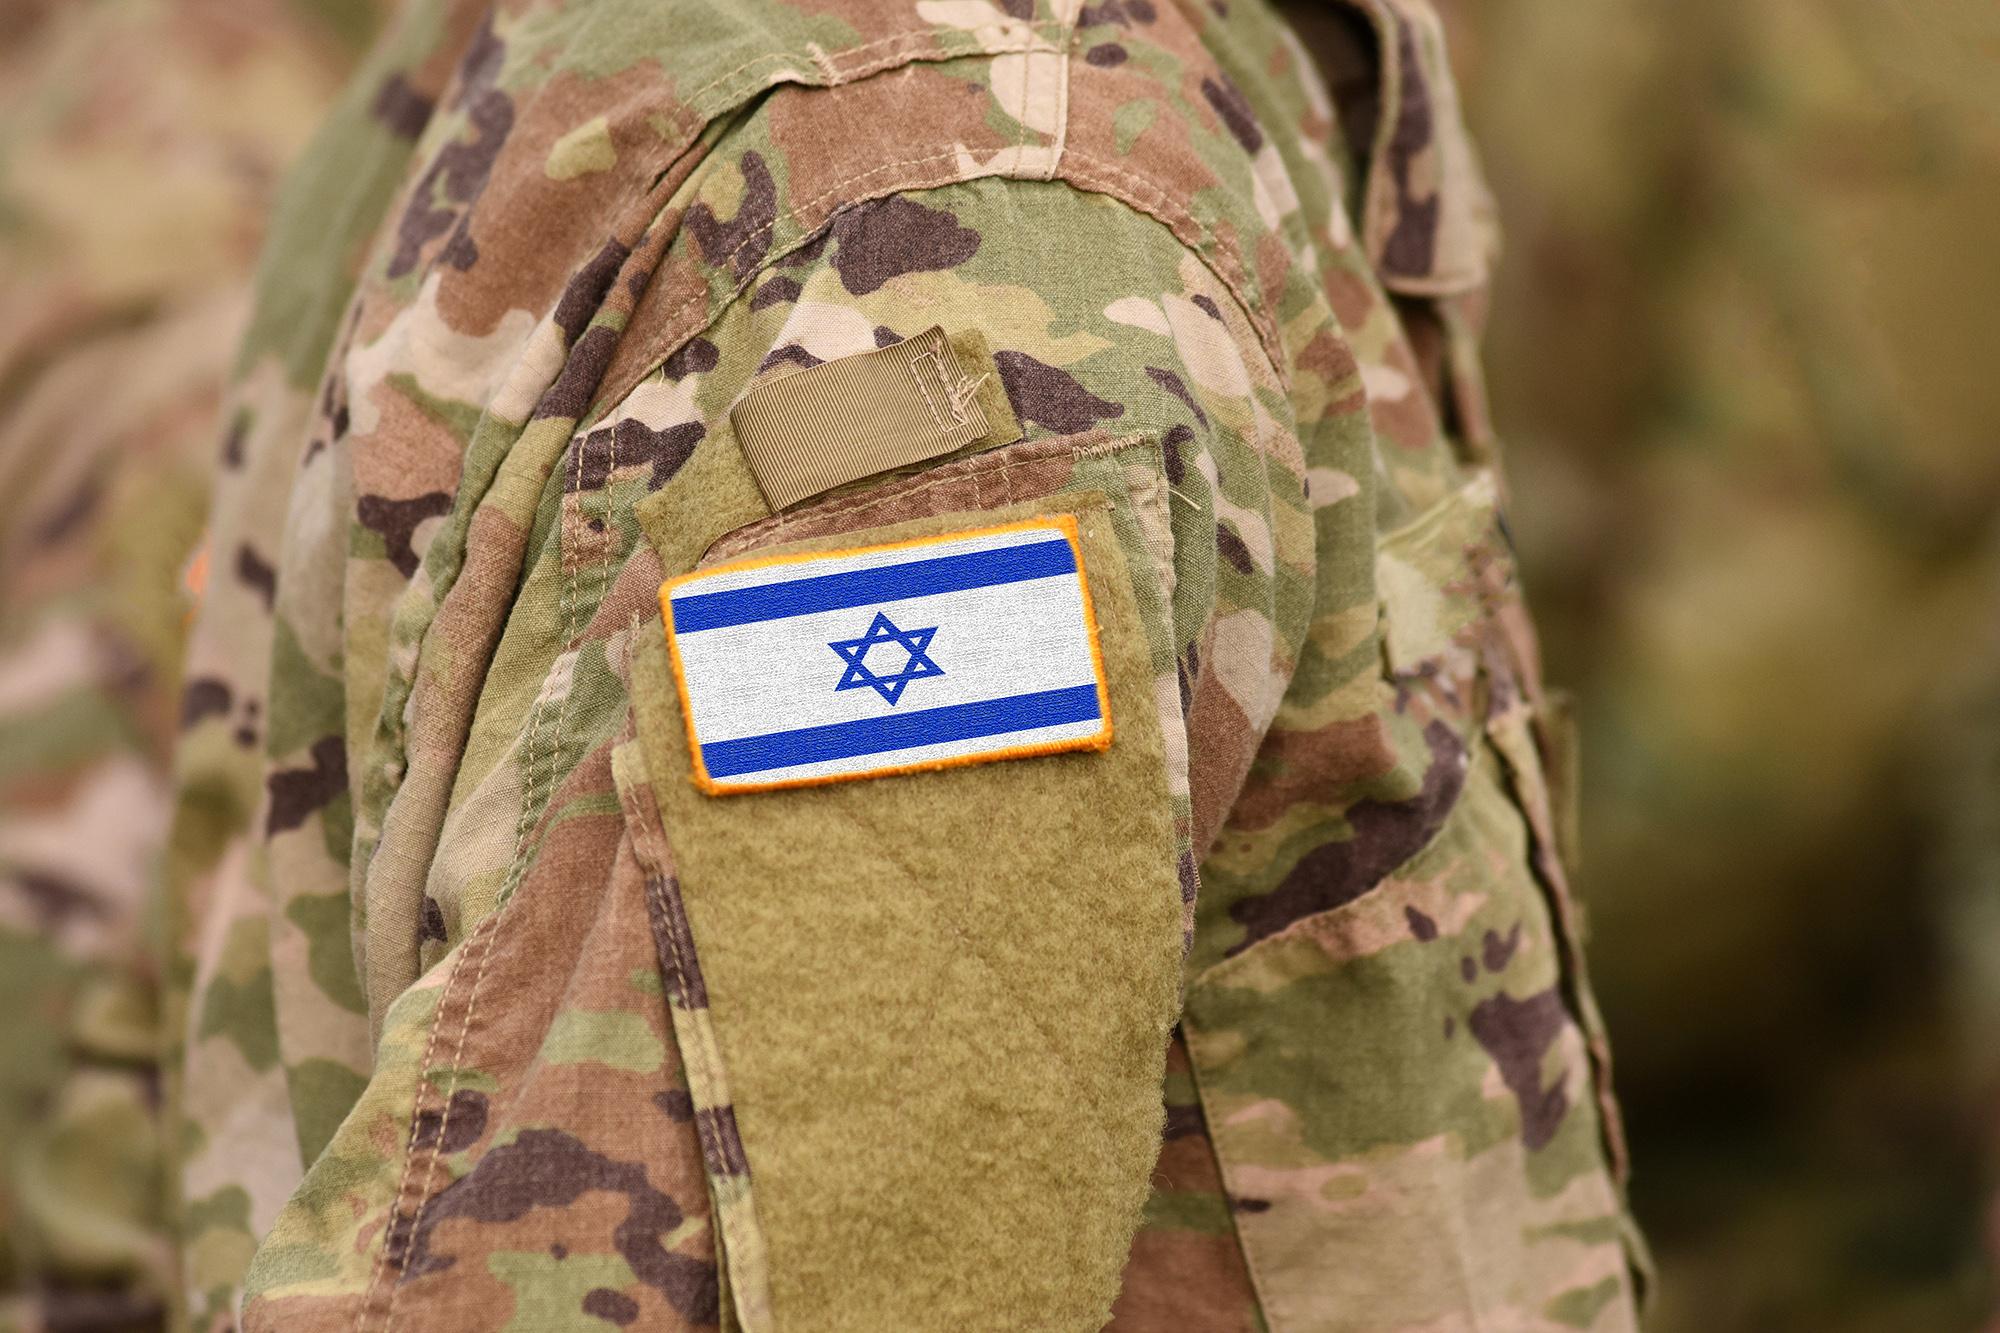 Israeli-defense-forces-idf-soldier-flag-